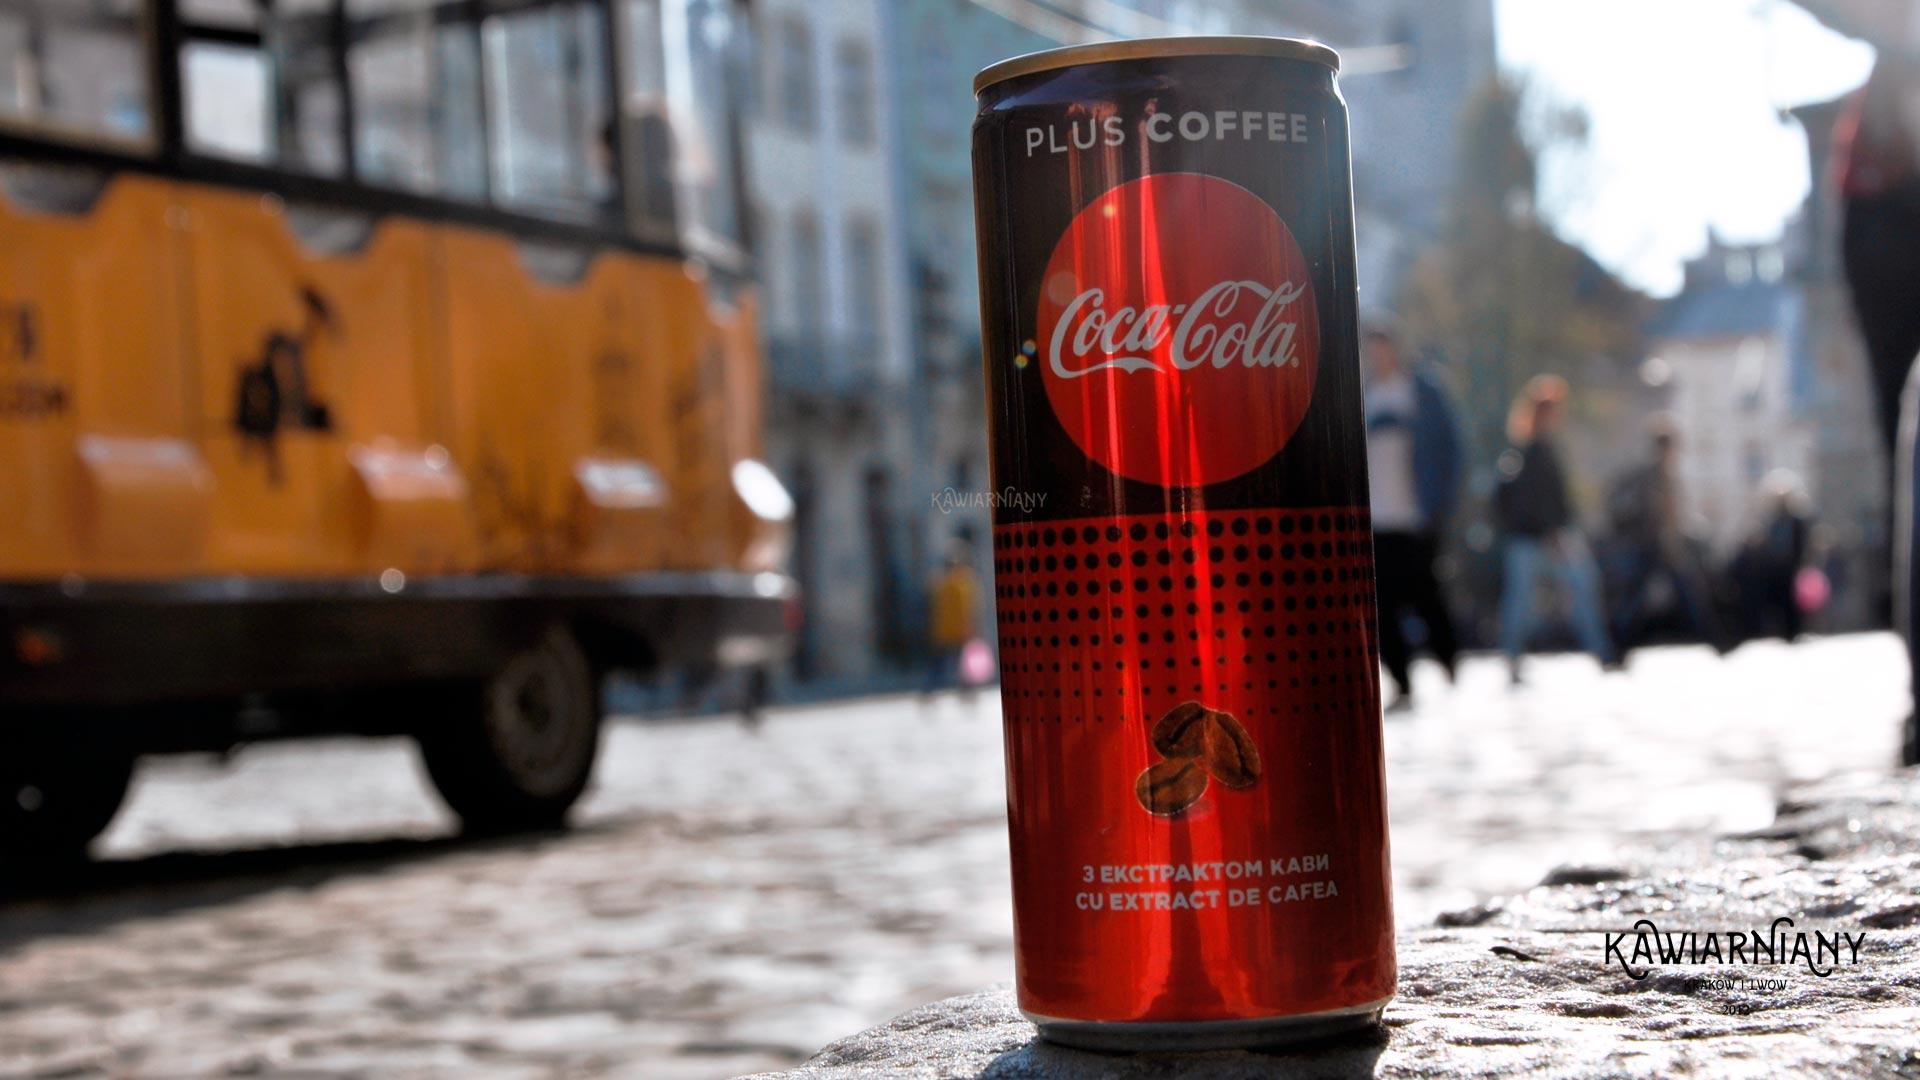 Puszka już za 1,13 zł. Ile kosztuje Coca Cola i Pepsi na Ukrainie?